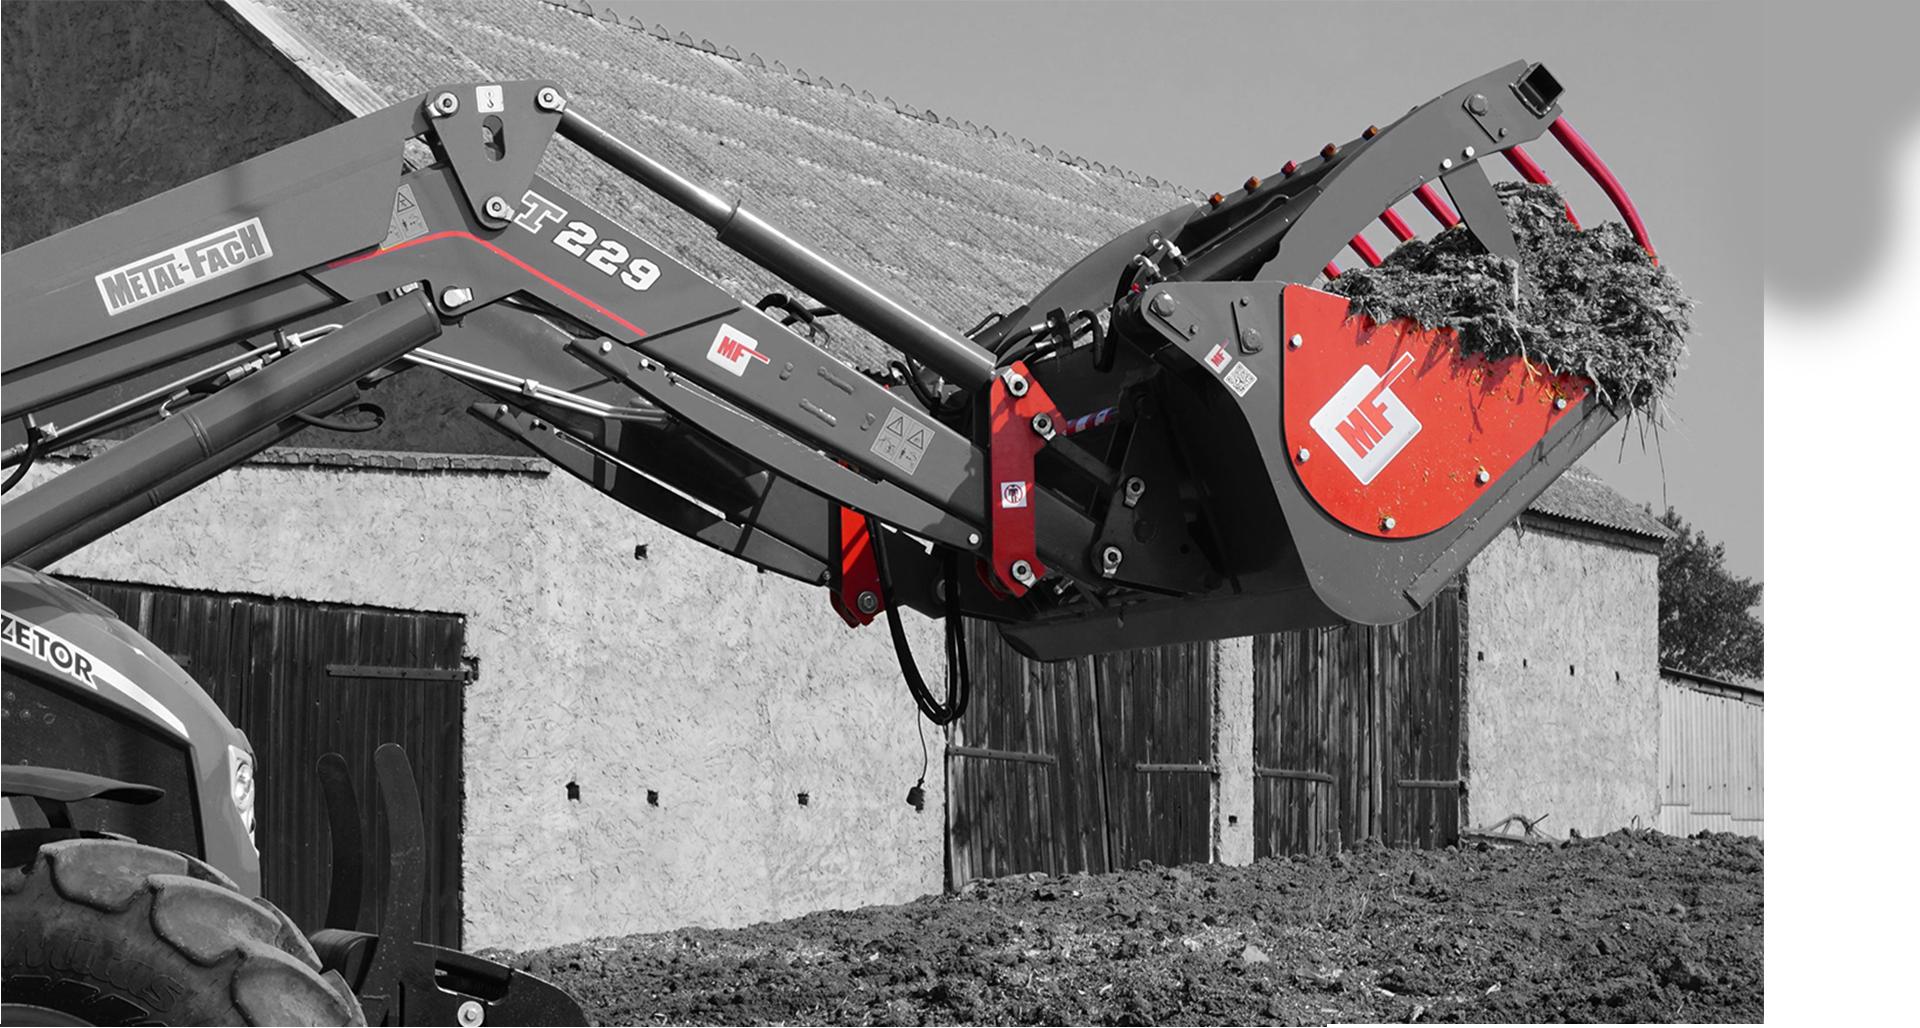 MF Front loader equipment